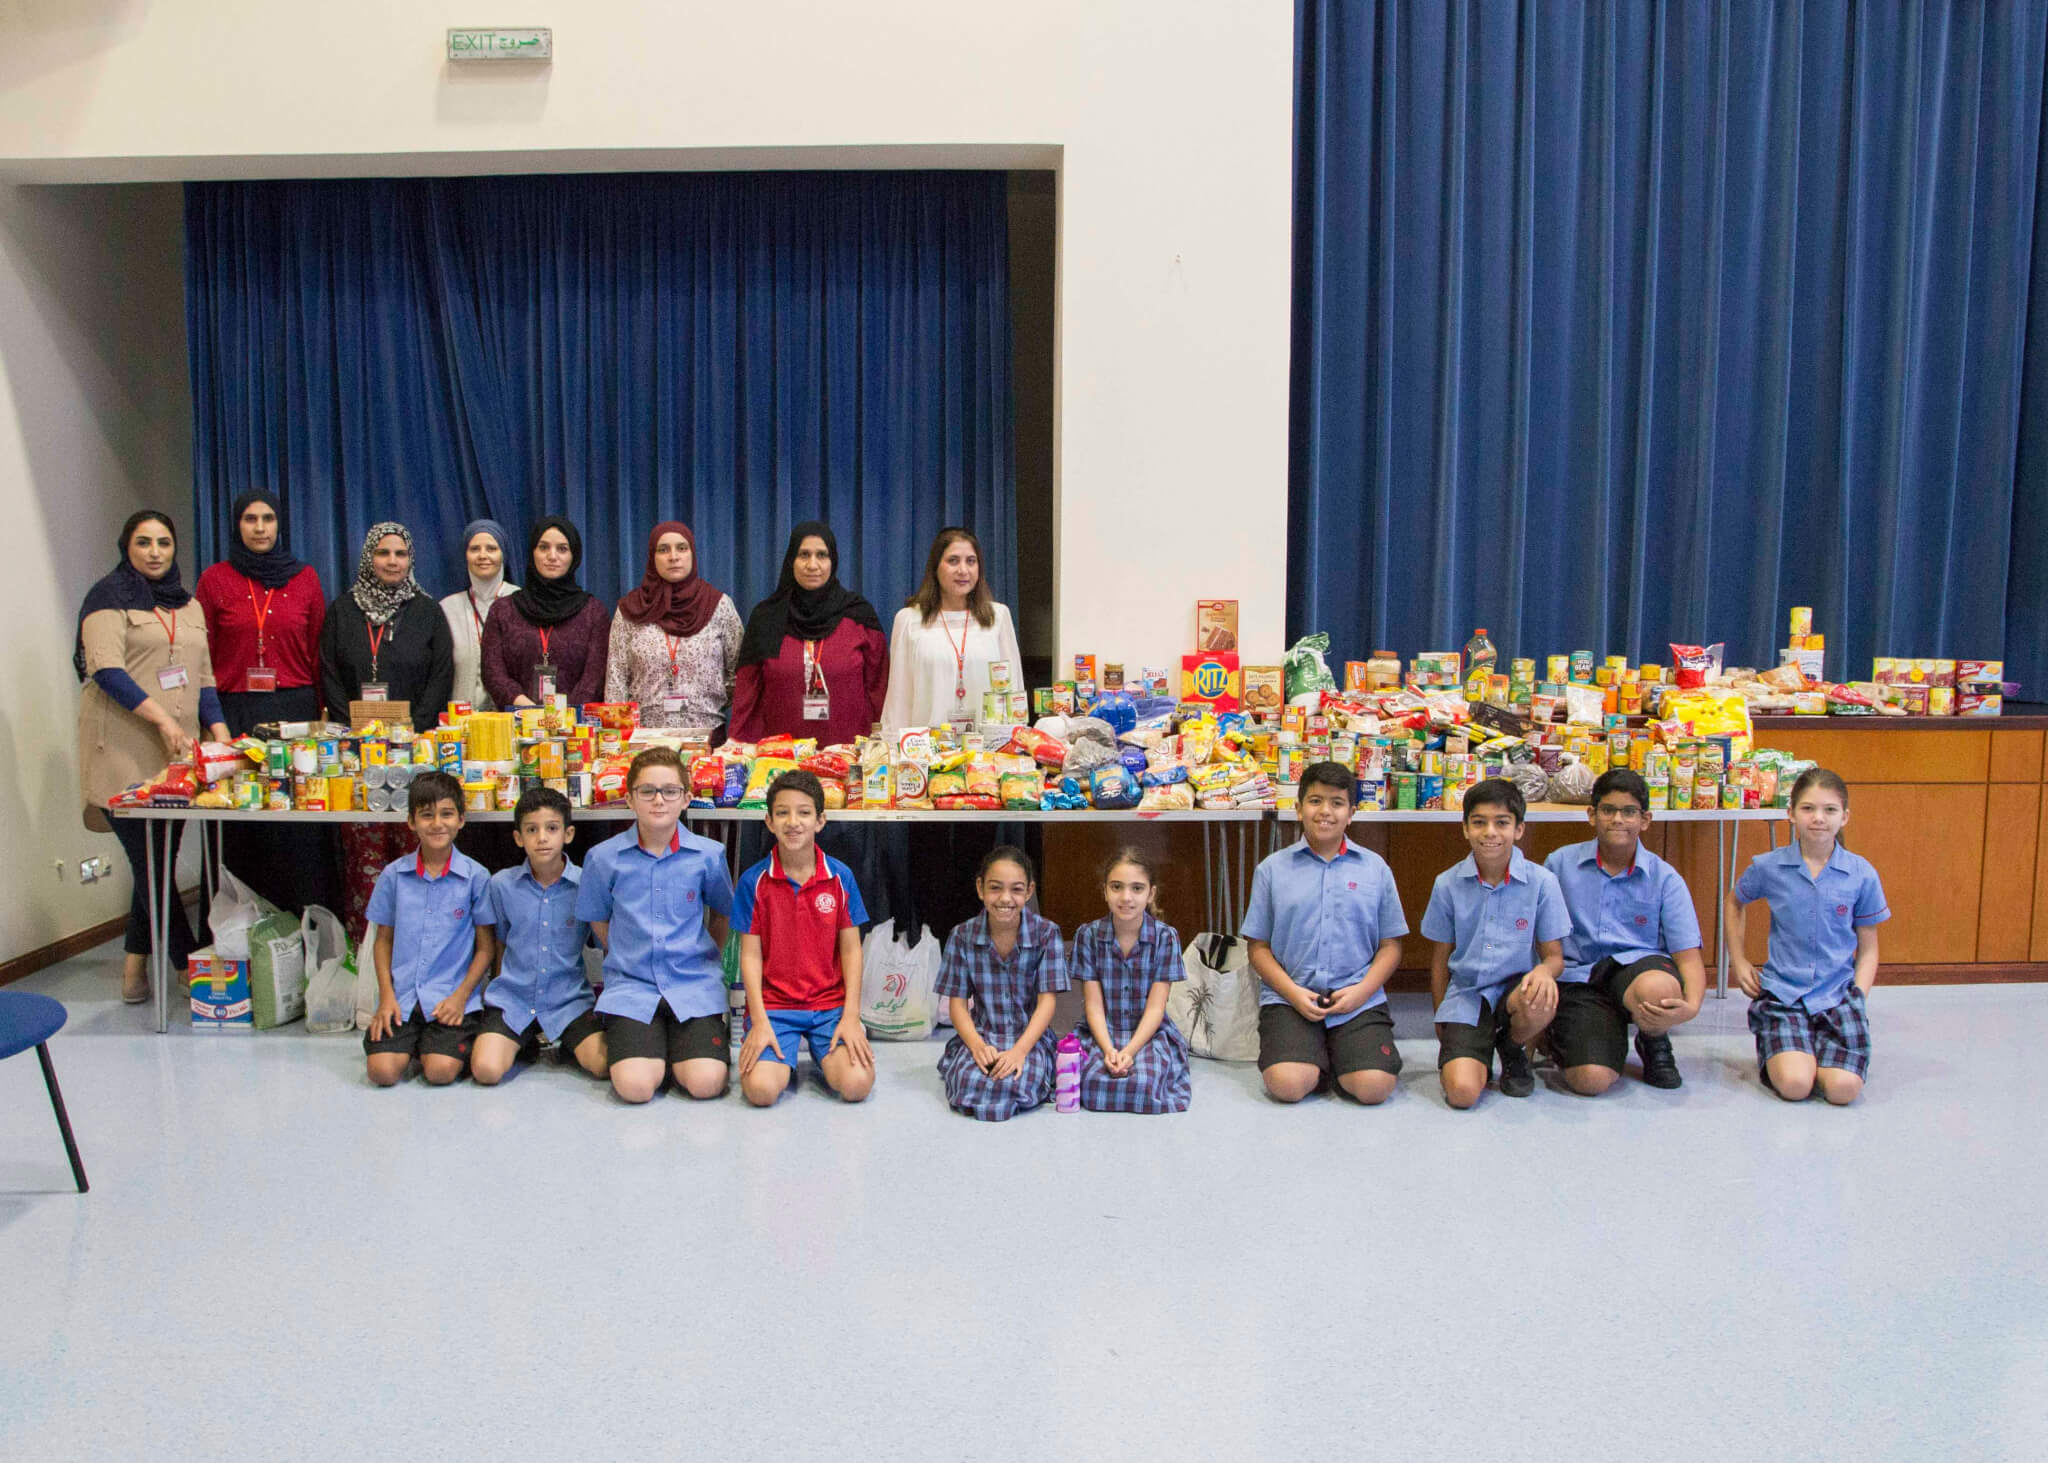 Harvest_Islam_Assembly_032 - Julie Jardine